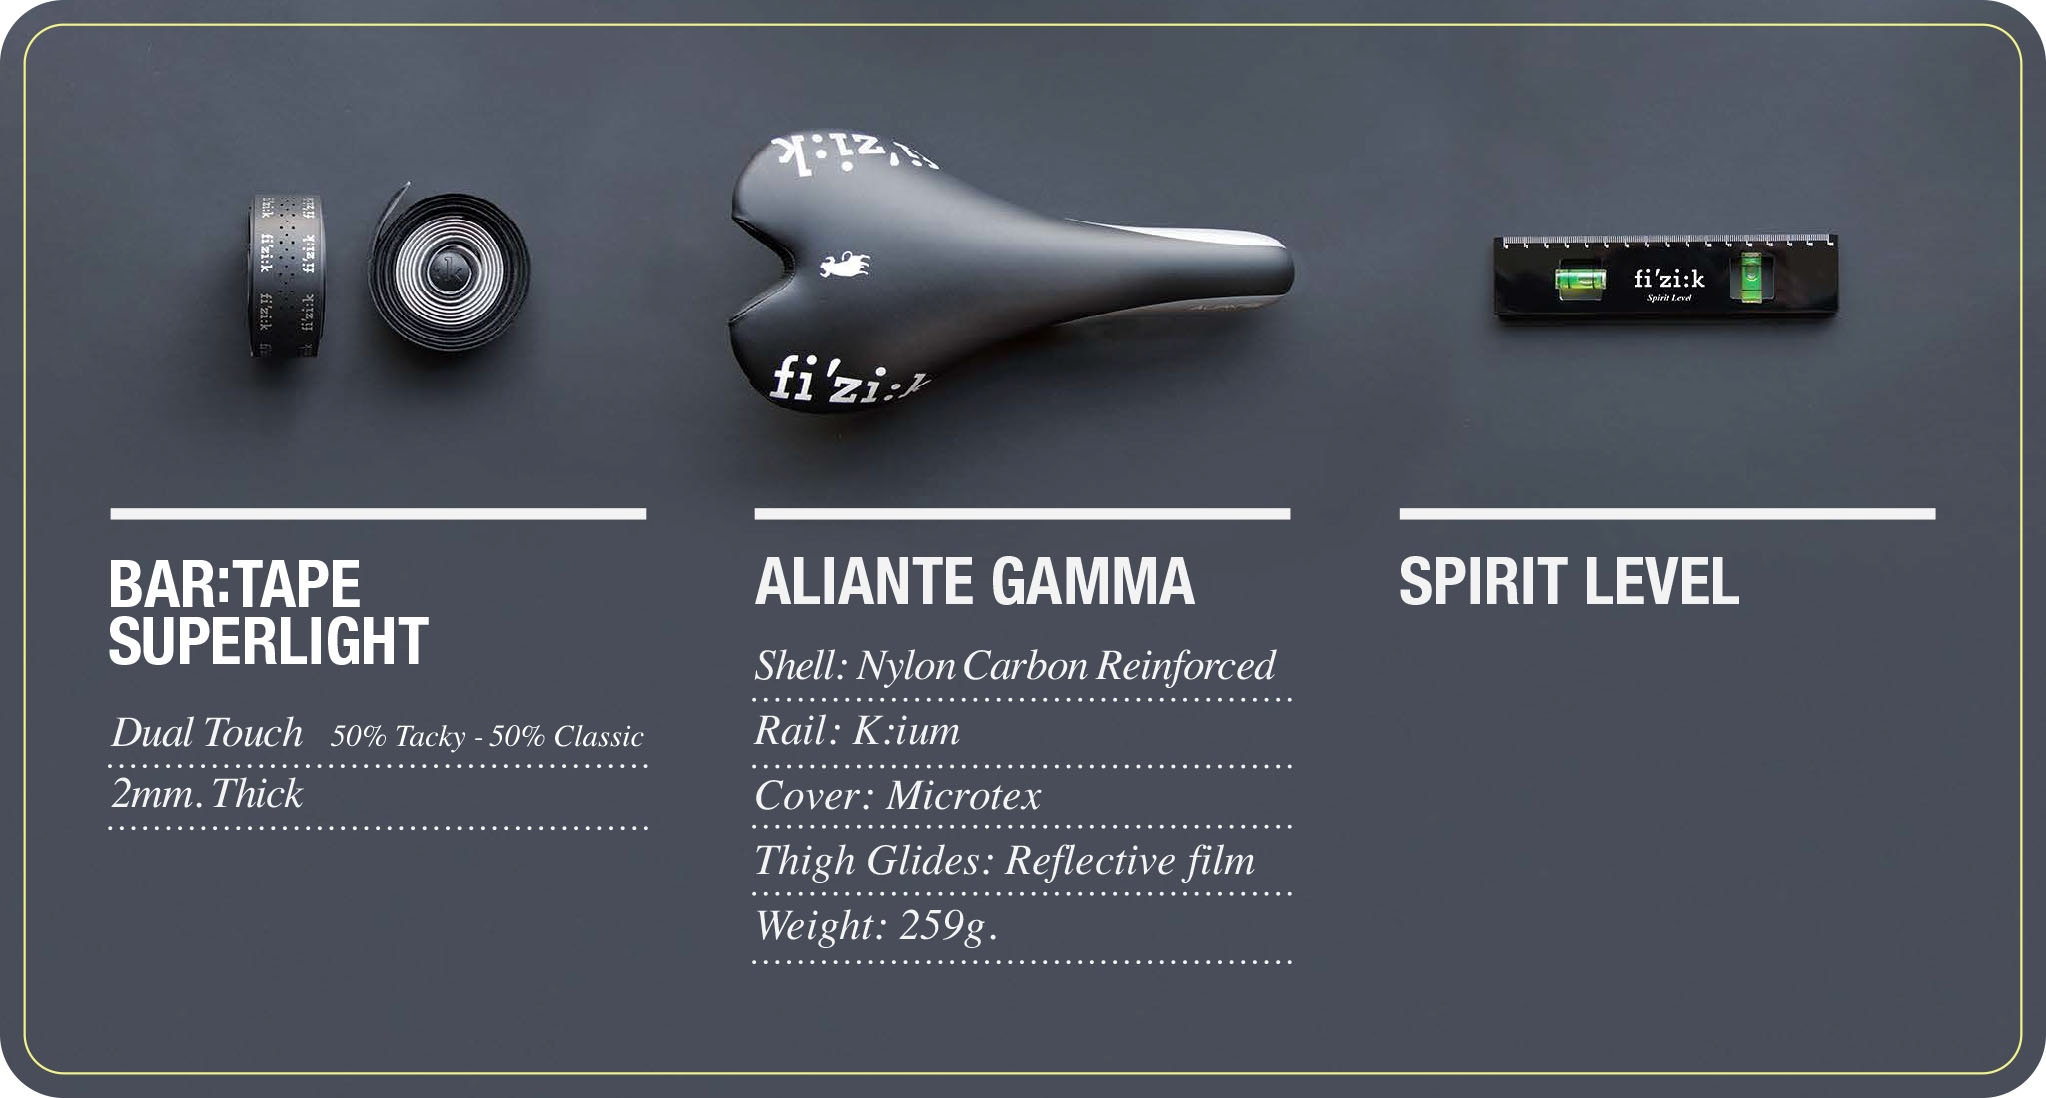 Aliante R3 Tour Edition